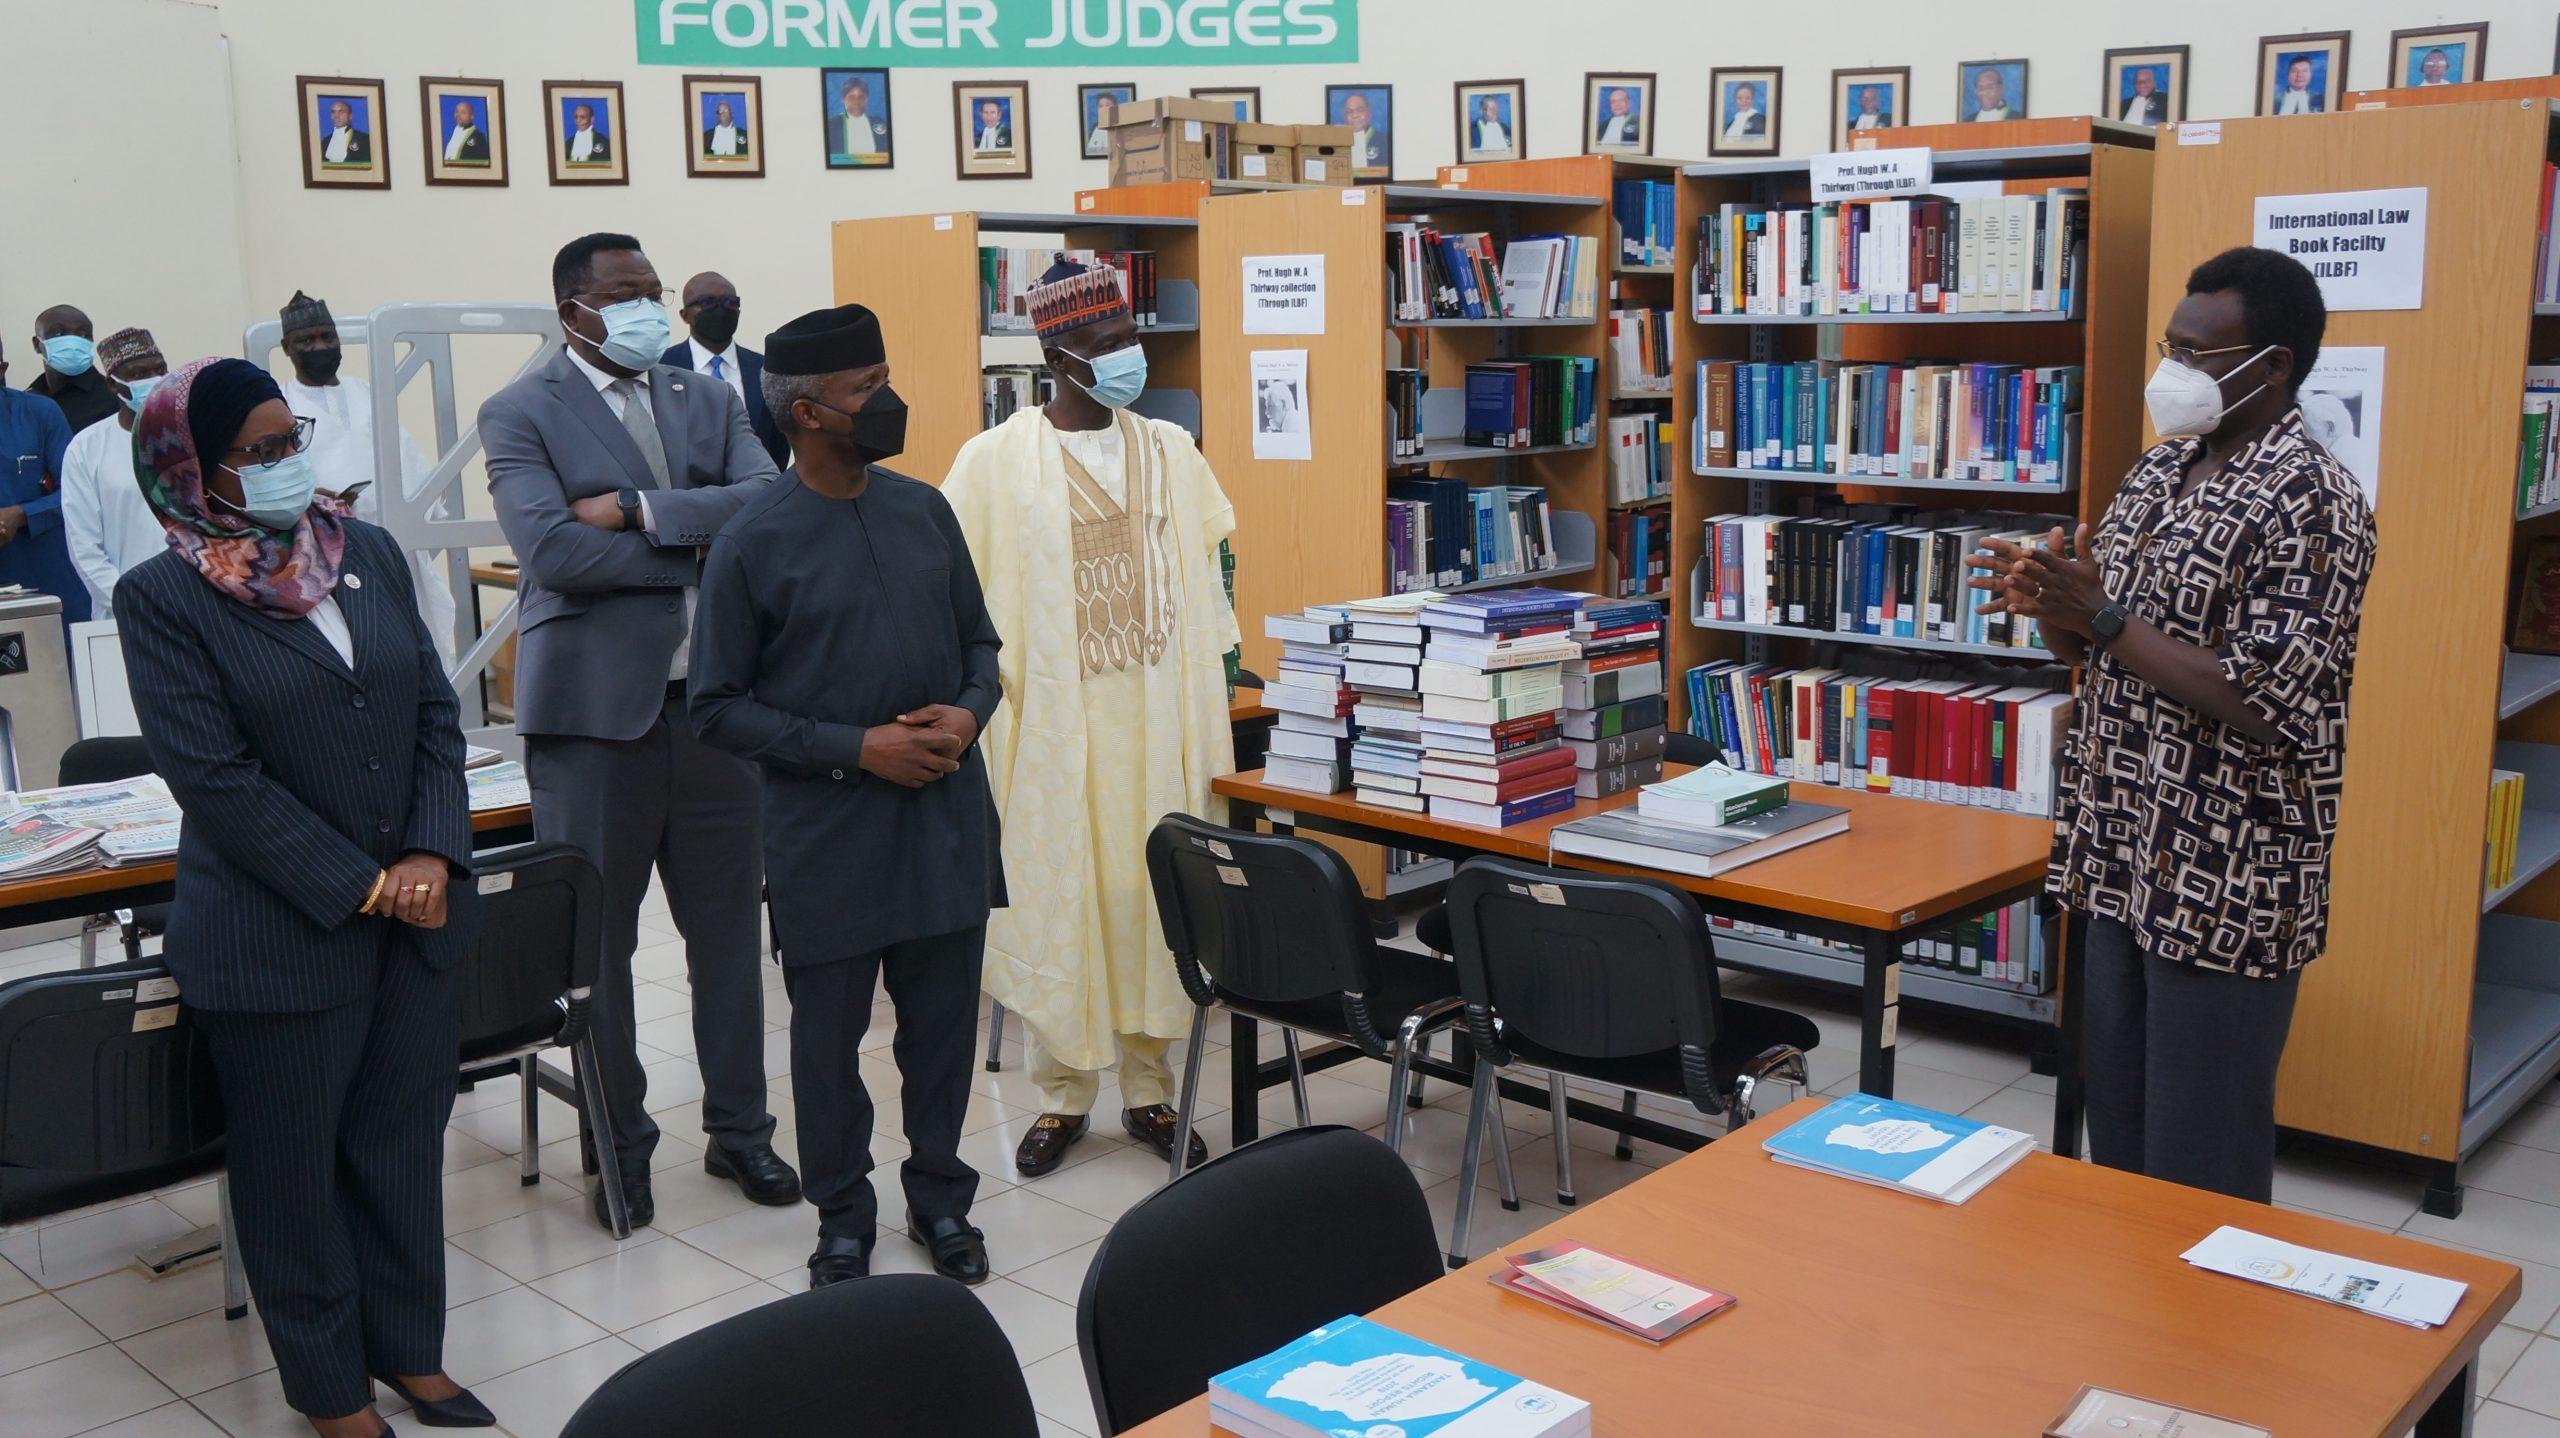 VICE-PRESIDENTE NIGENERIANA FAMILIARIZA-SE COM O TRIBUNAL AFRICANO